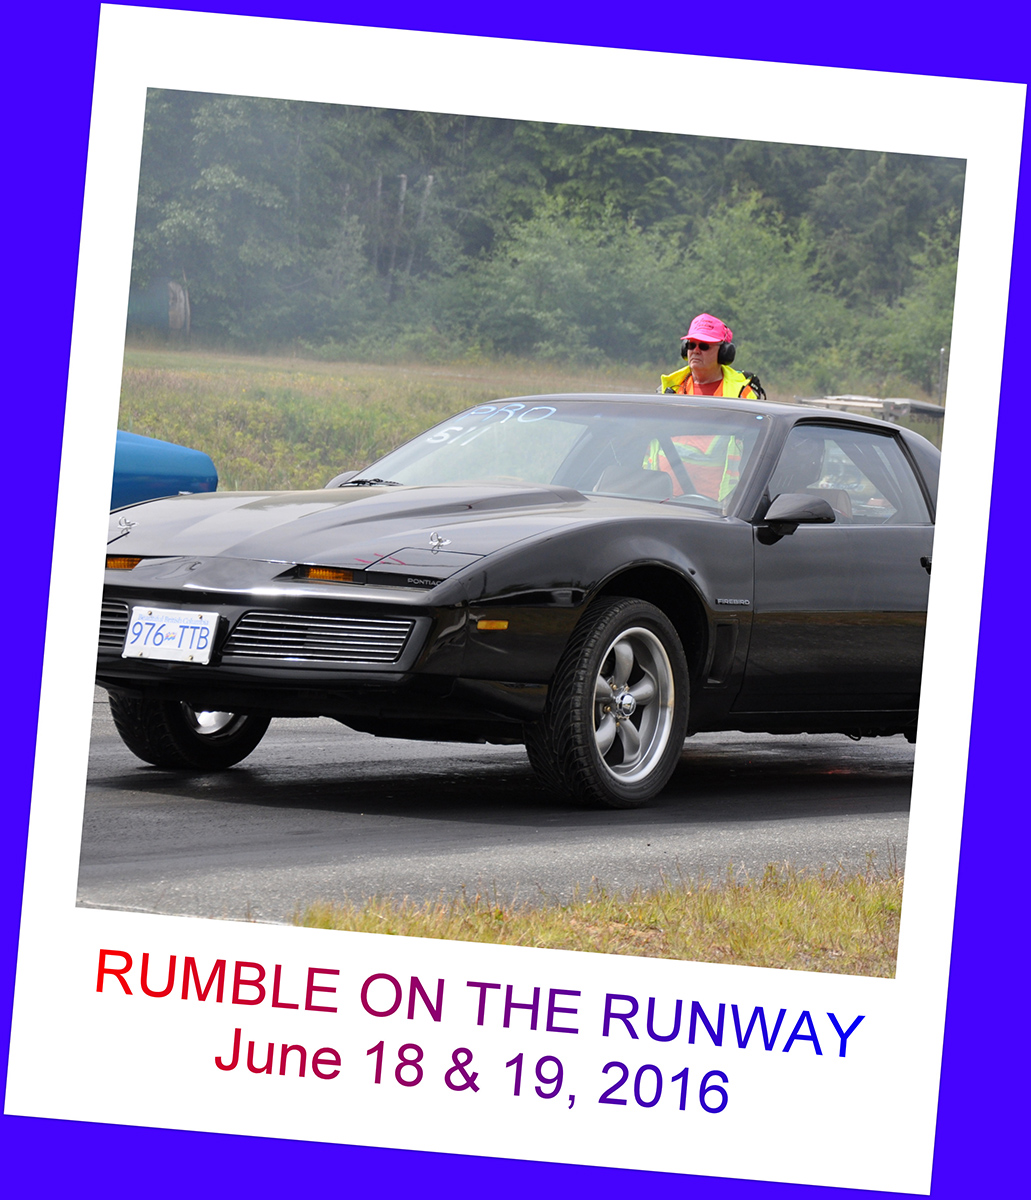 Rumble on the Runway June 18 & 19, 2016 1295